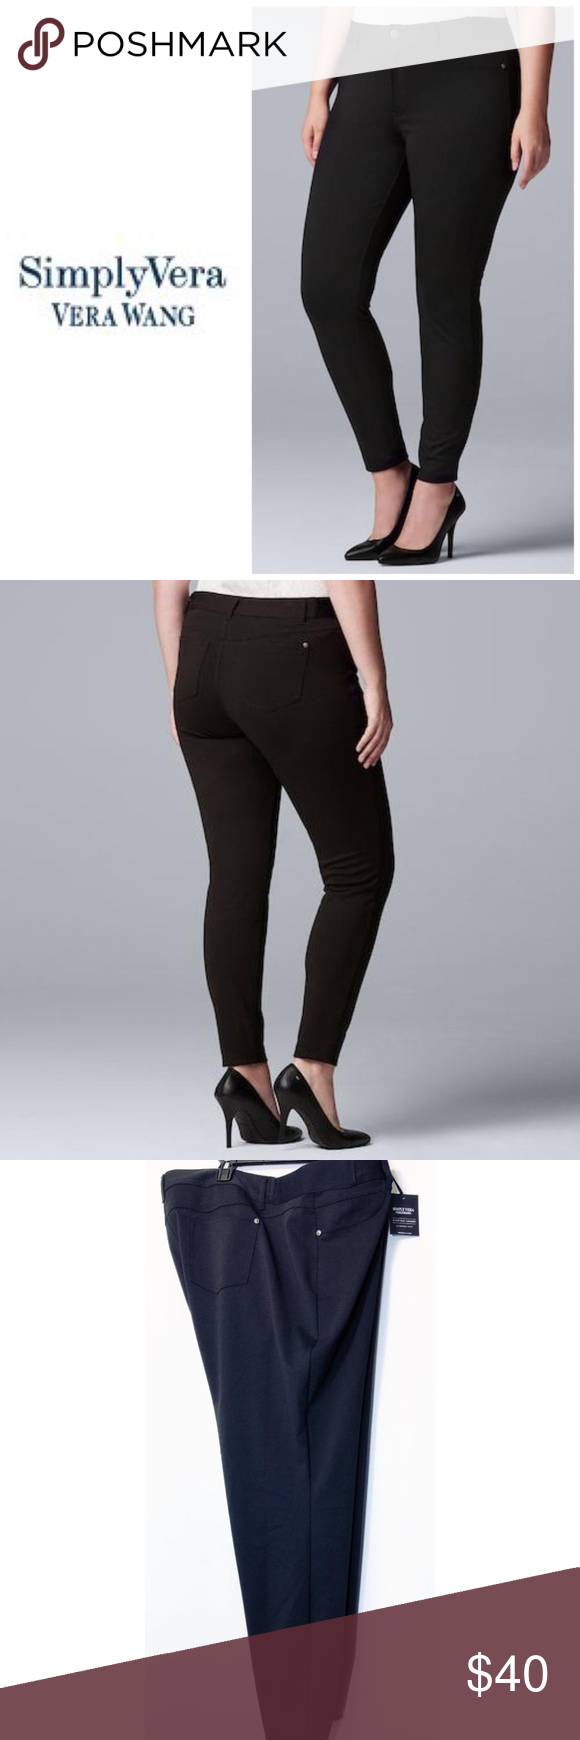 400314d3a26 Simply Vera Wang Black Skinny Pants Plus Sz 3X NWT Plus Size Simply Vera  Vera Wang